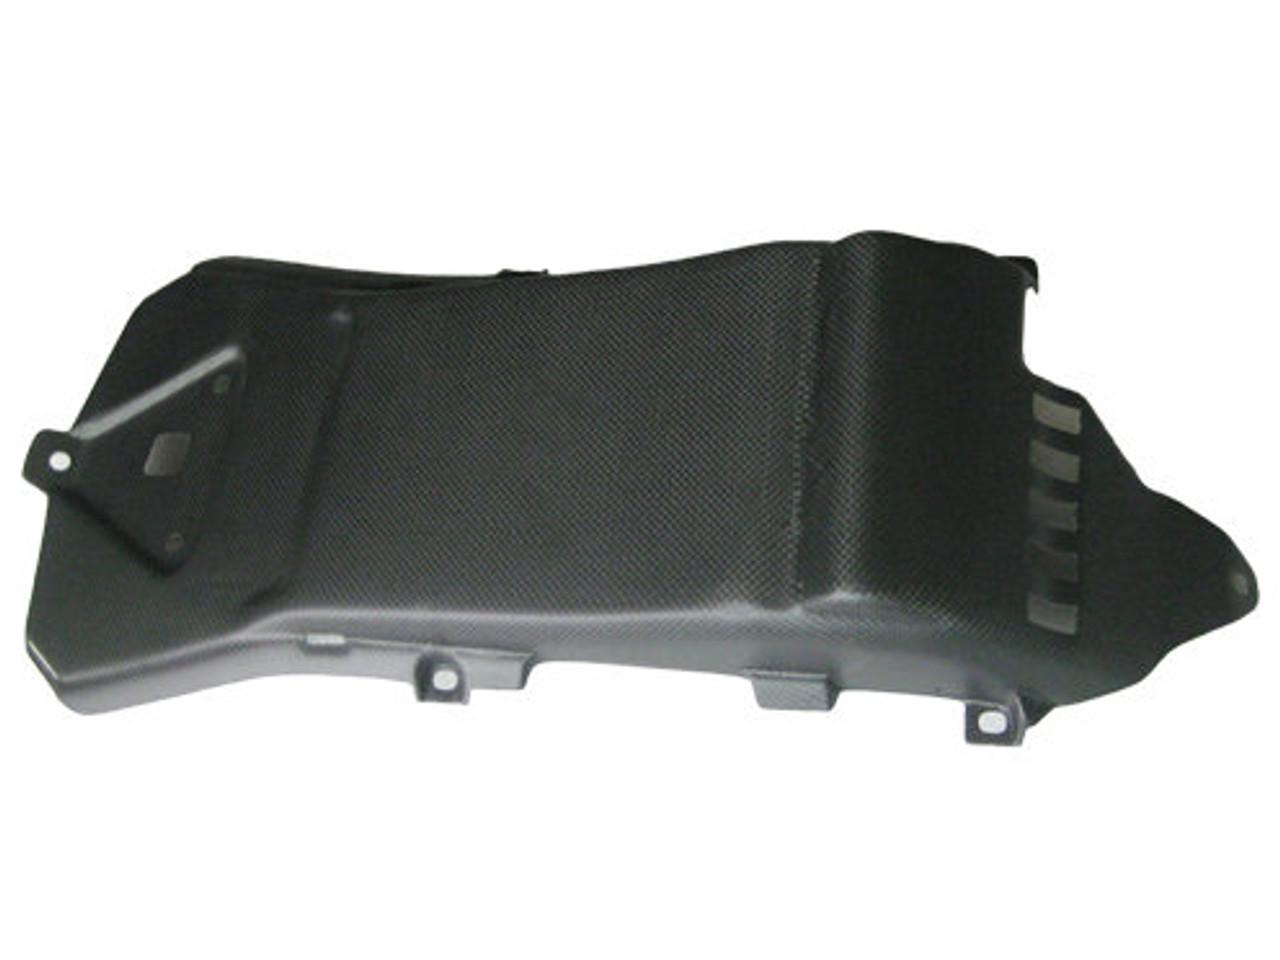 Matte Plain Weave Carbon Fiber Undertail for Aprilia RSV4 09+, Tuono V4 11+